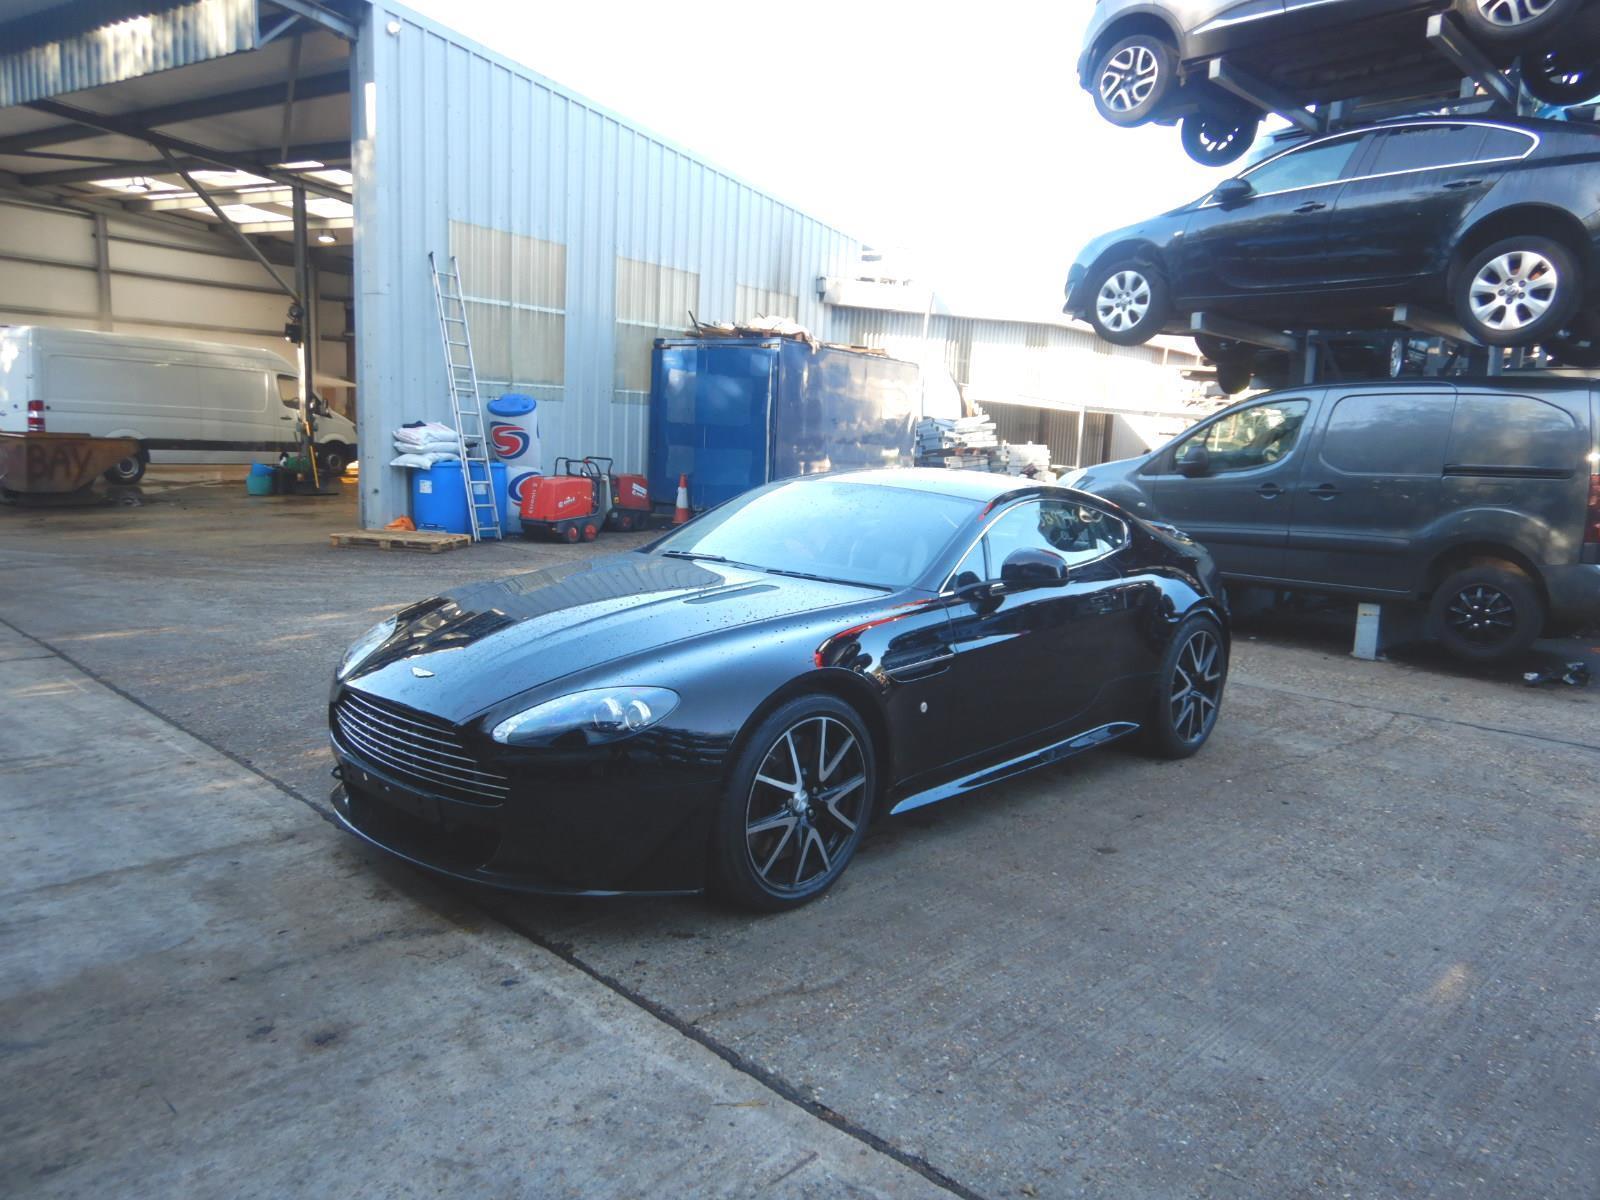 2013 Aston Martin Vantage S 4735cc Petrol Automatic 7 Speed 2 Door Coupe